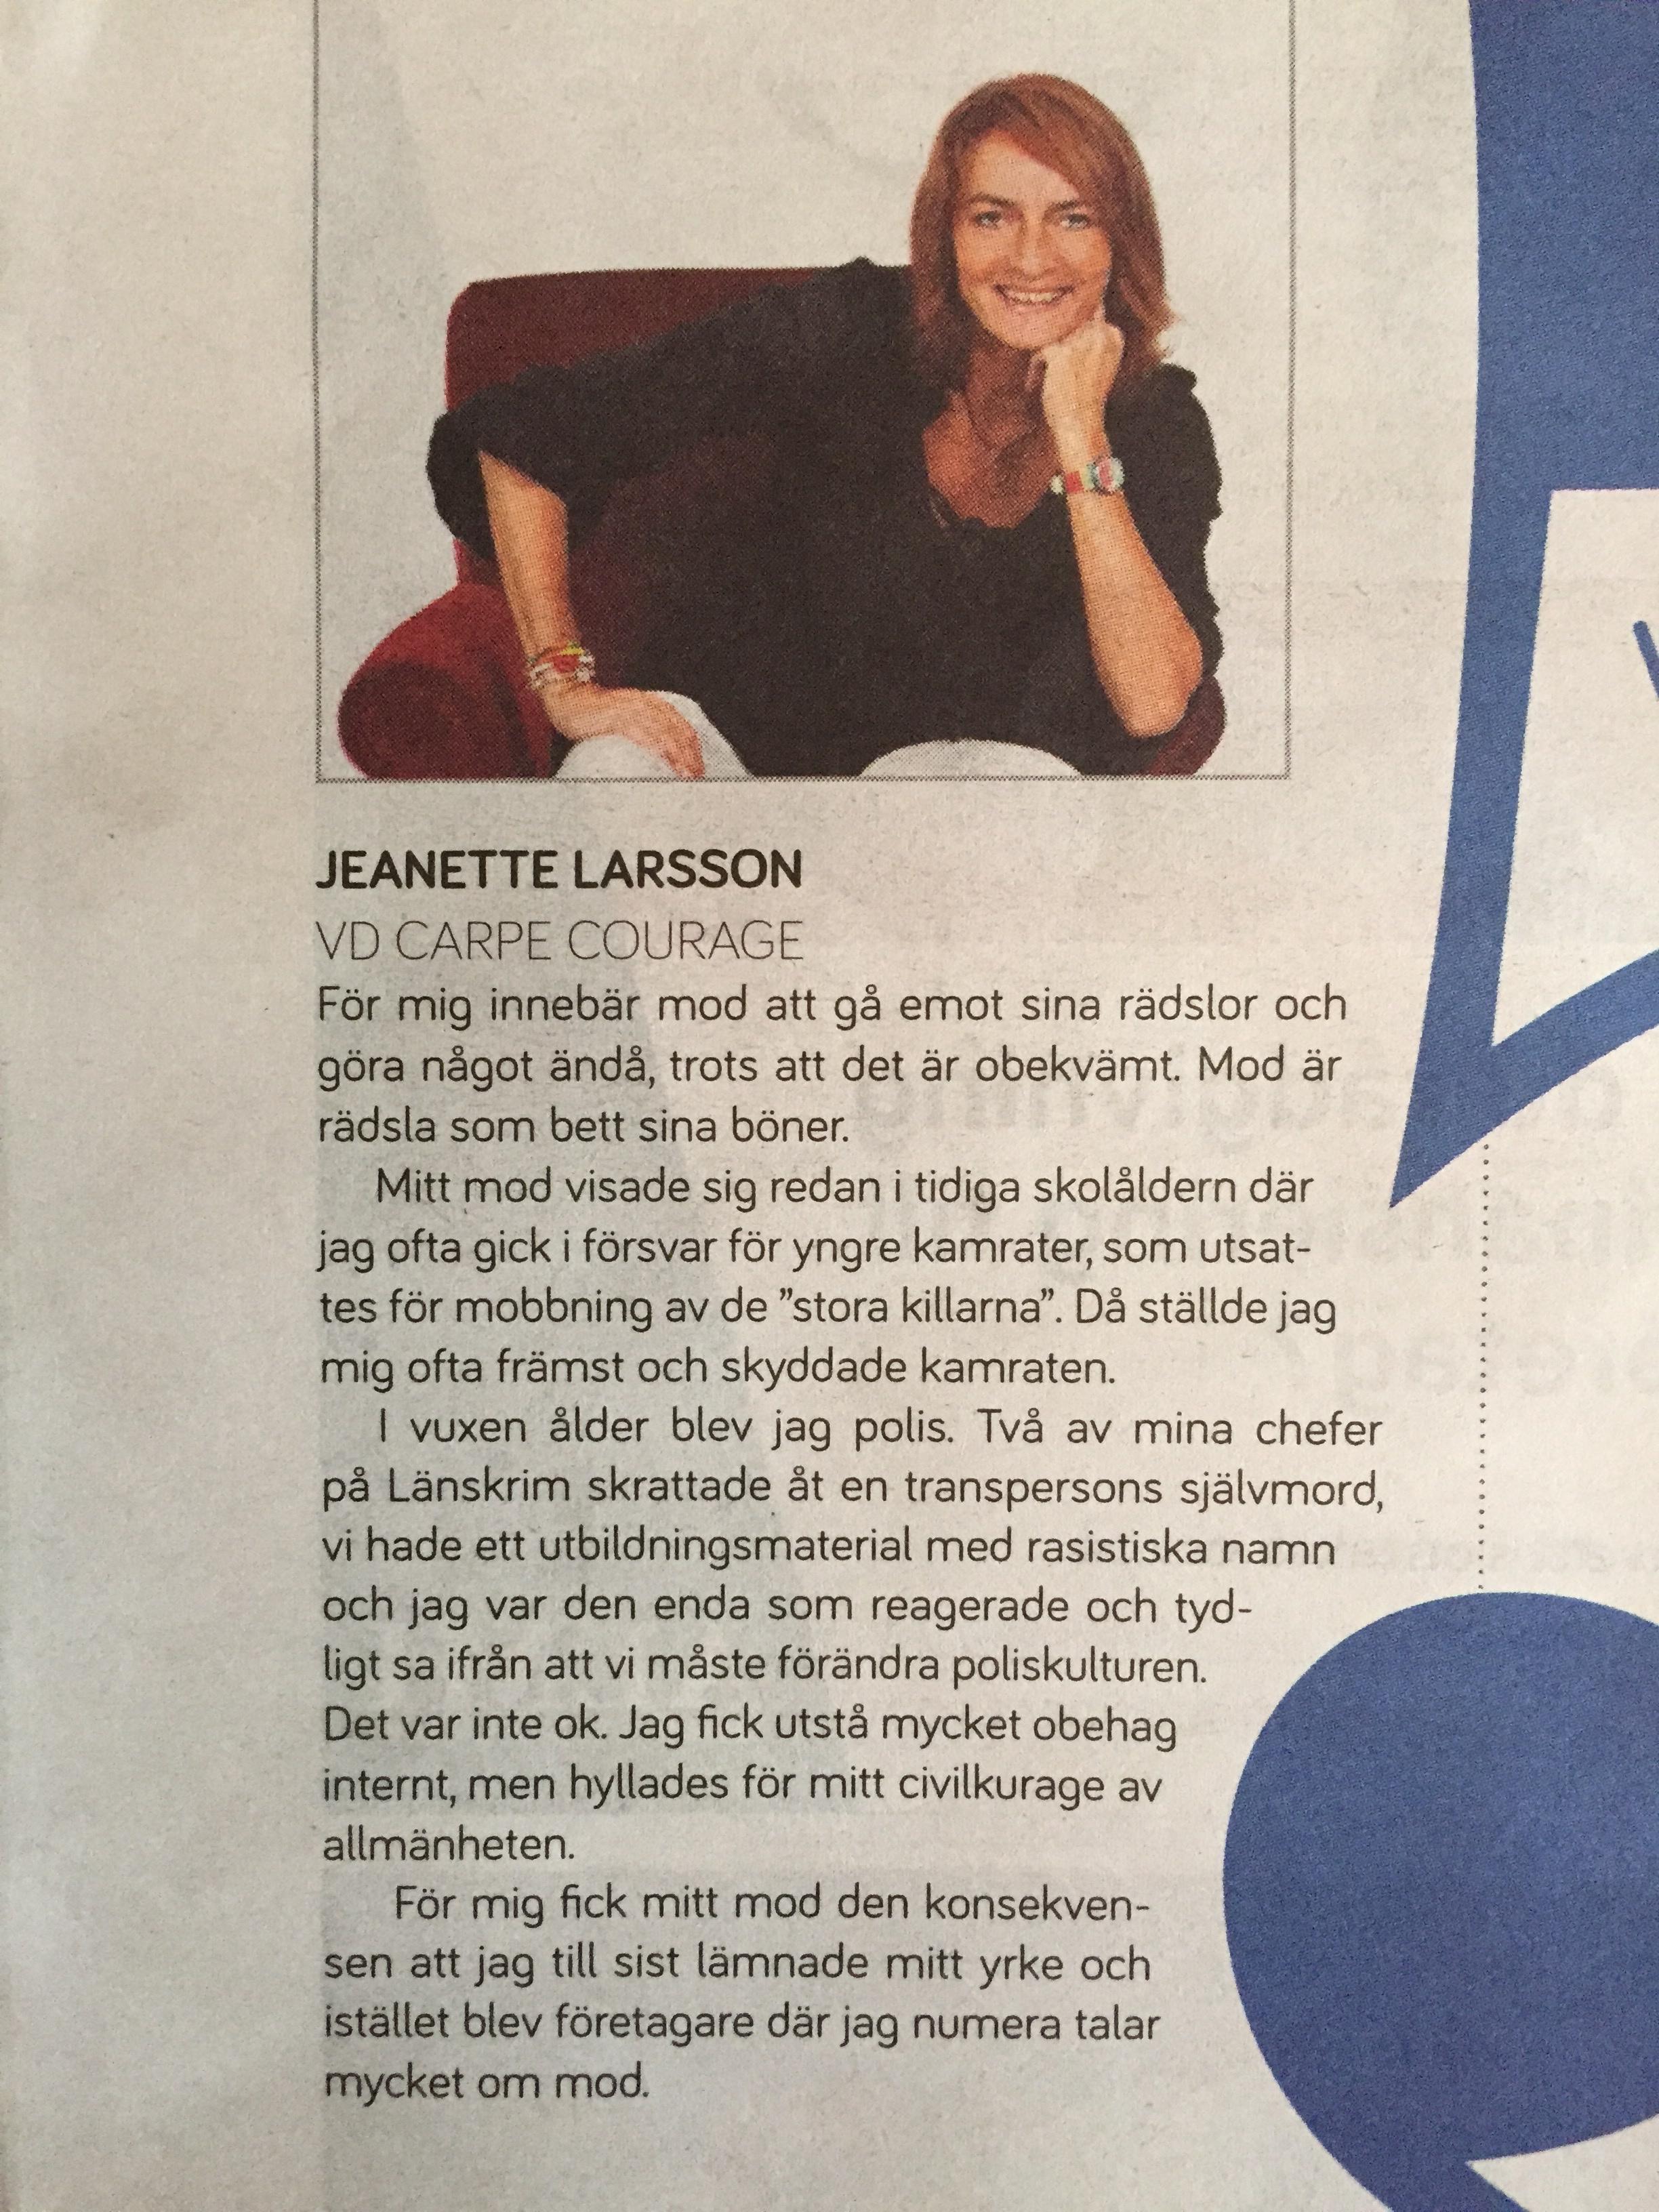 Sydsvenskan, Malmö Näringsliv (Bilaga), 7 februari 2016, sid 12